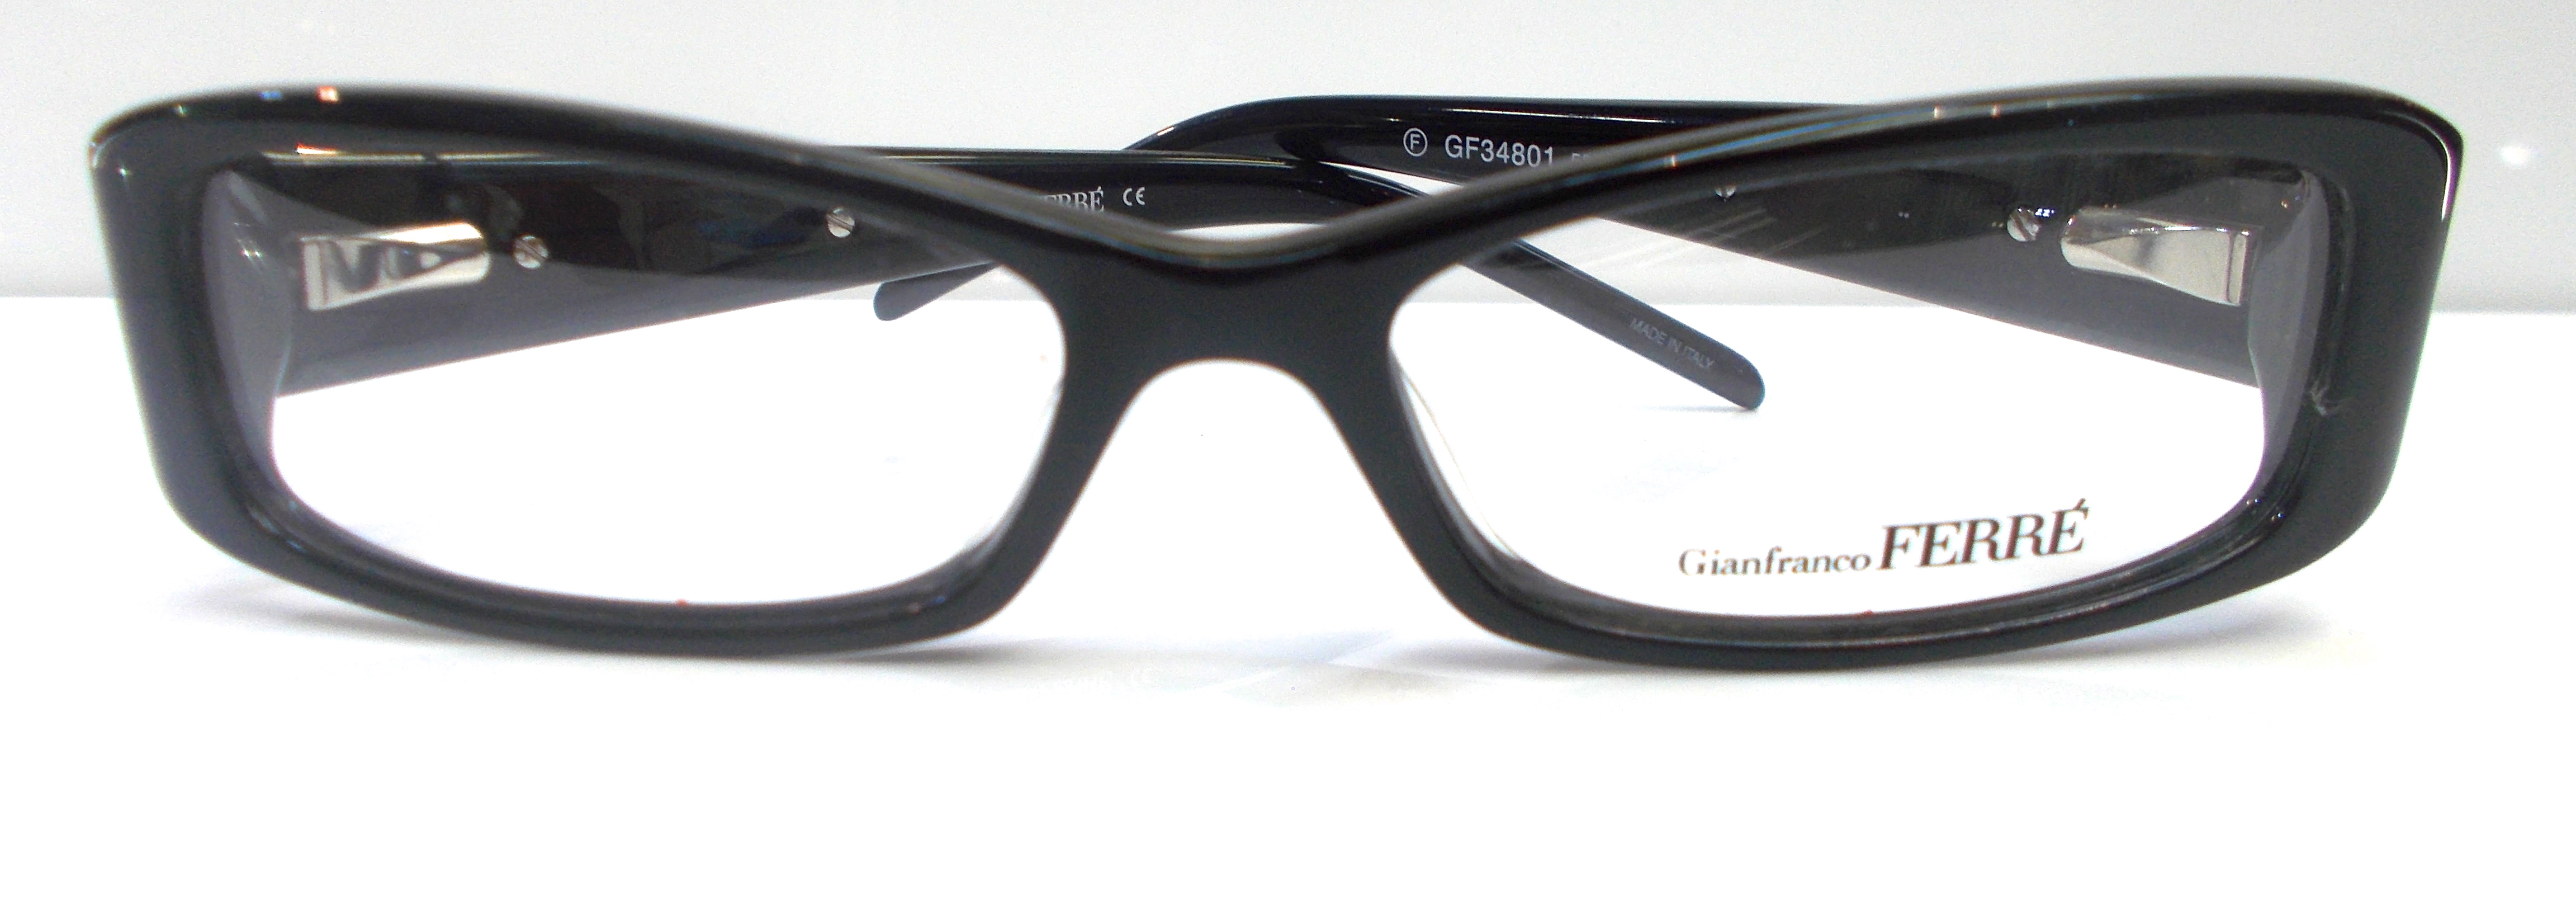 h s optical gianfranco ferre s eyewear gf34801